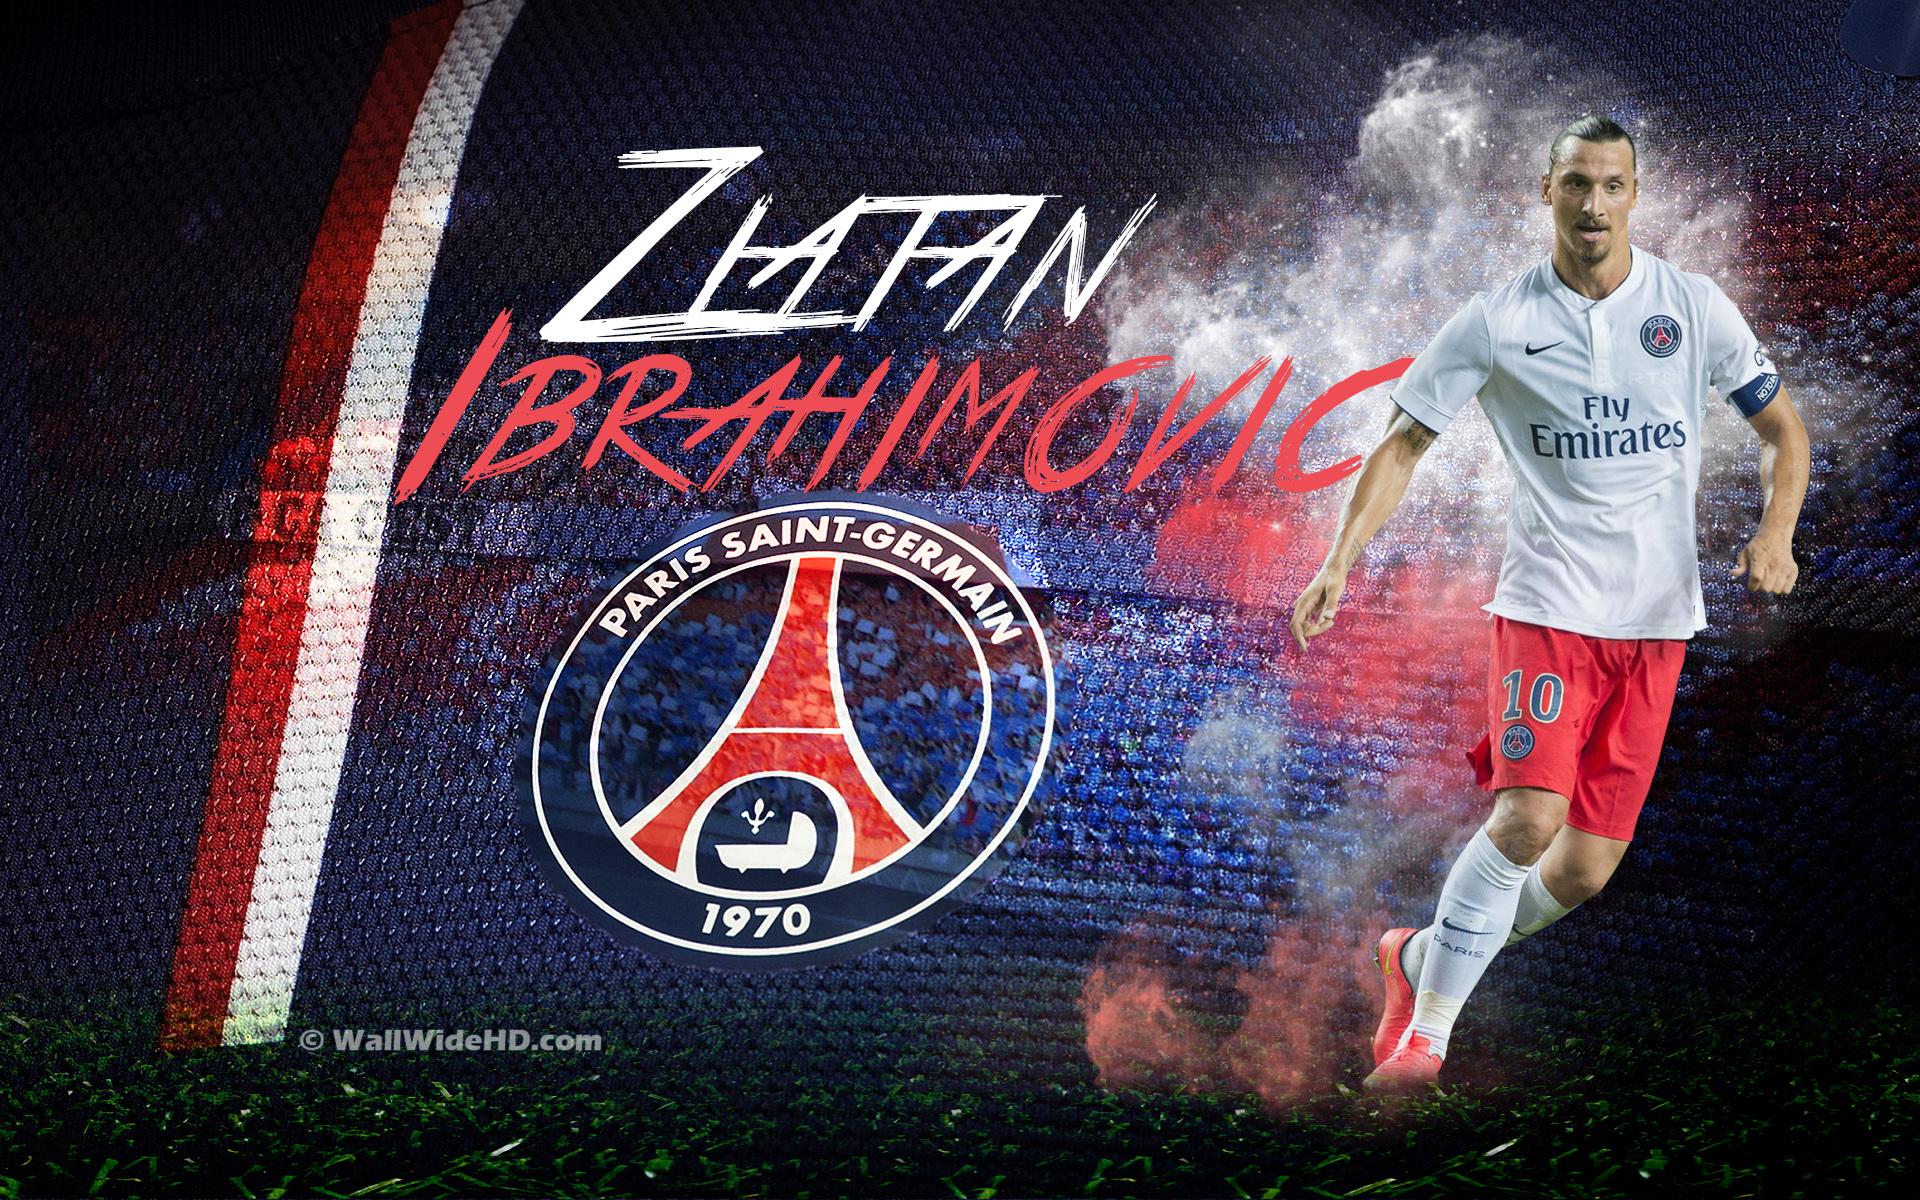 Zlatan Ibrahimovic 2015 PSG Wallpaperjpg Alienware Arena 1920x1200